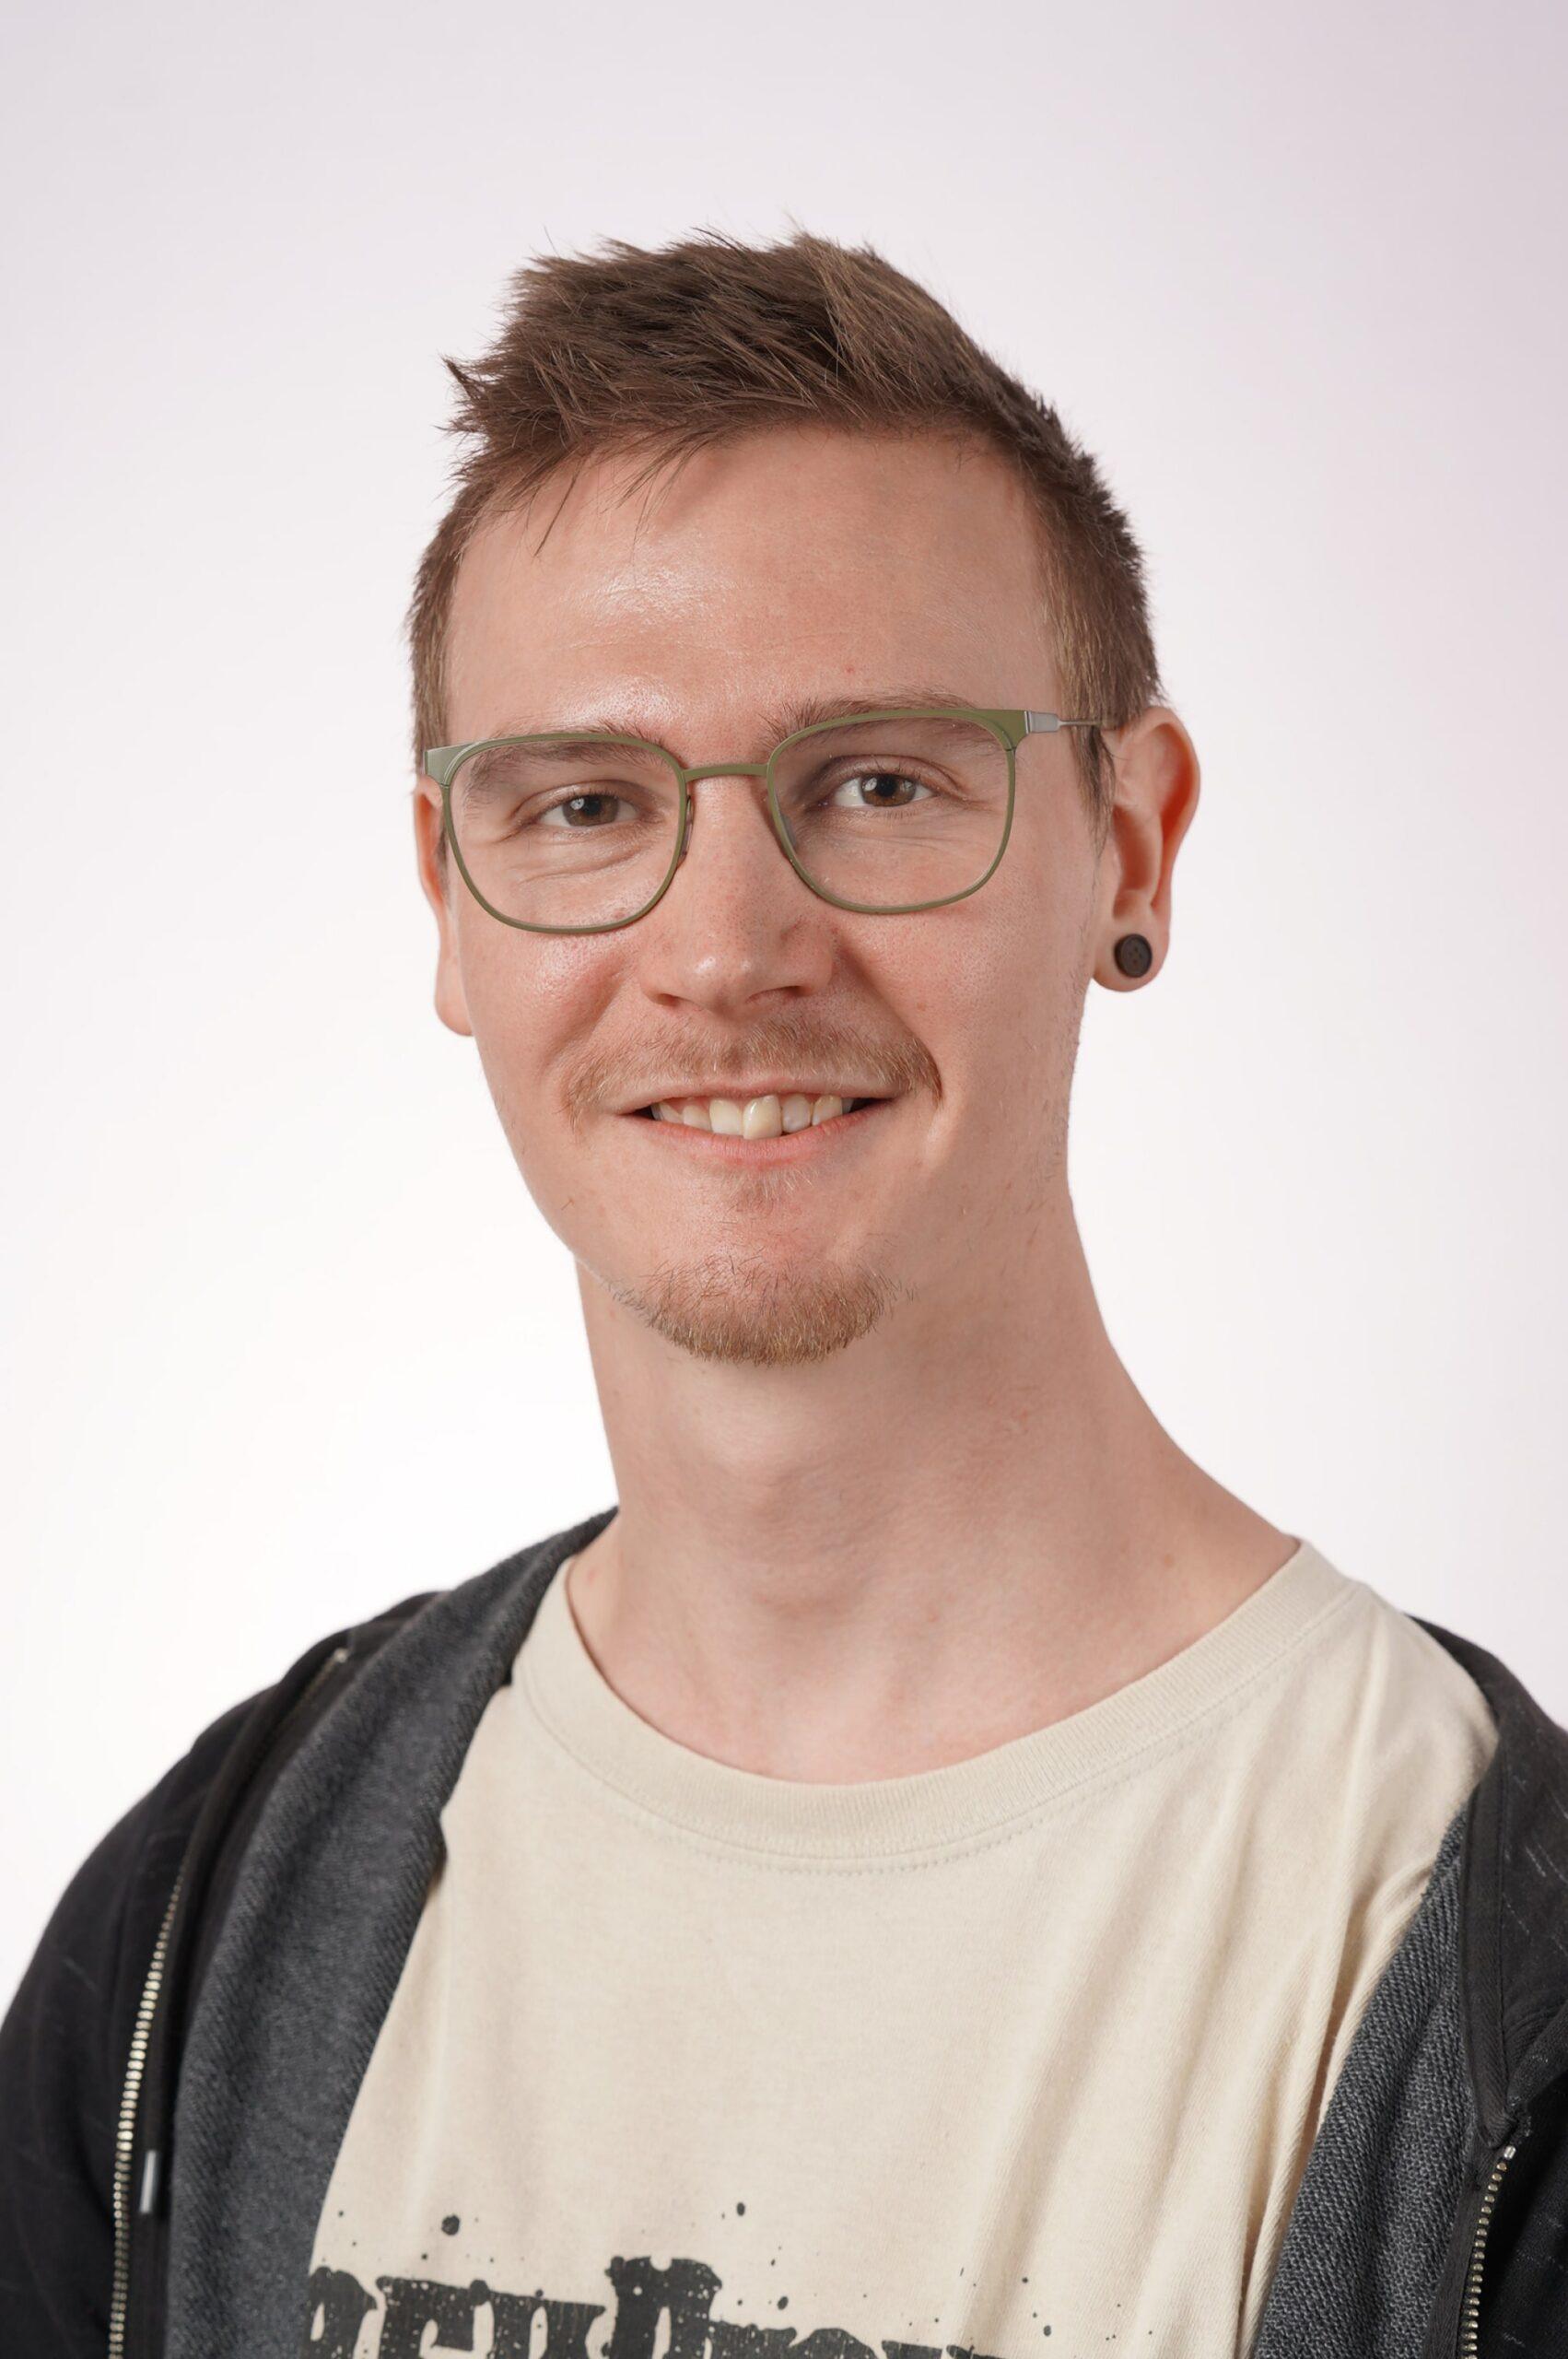 Emil Knudsen